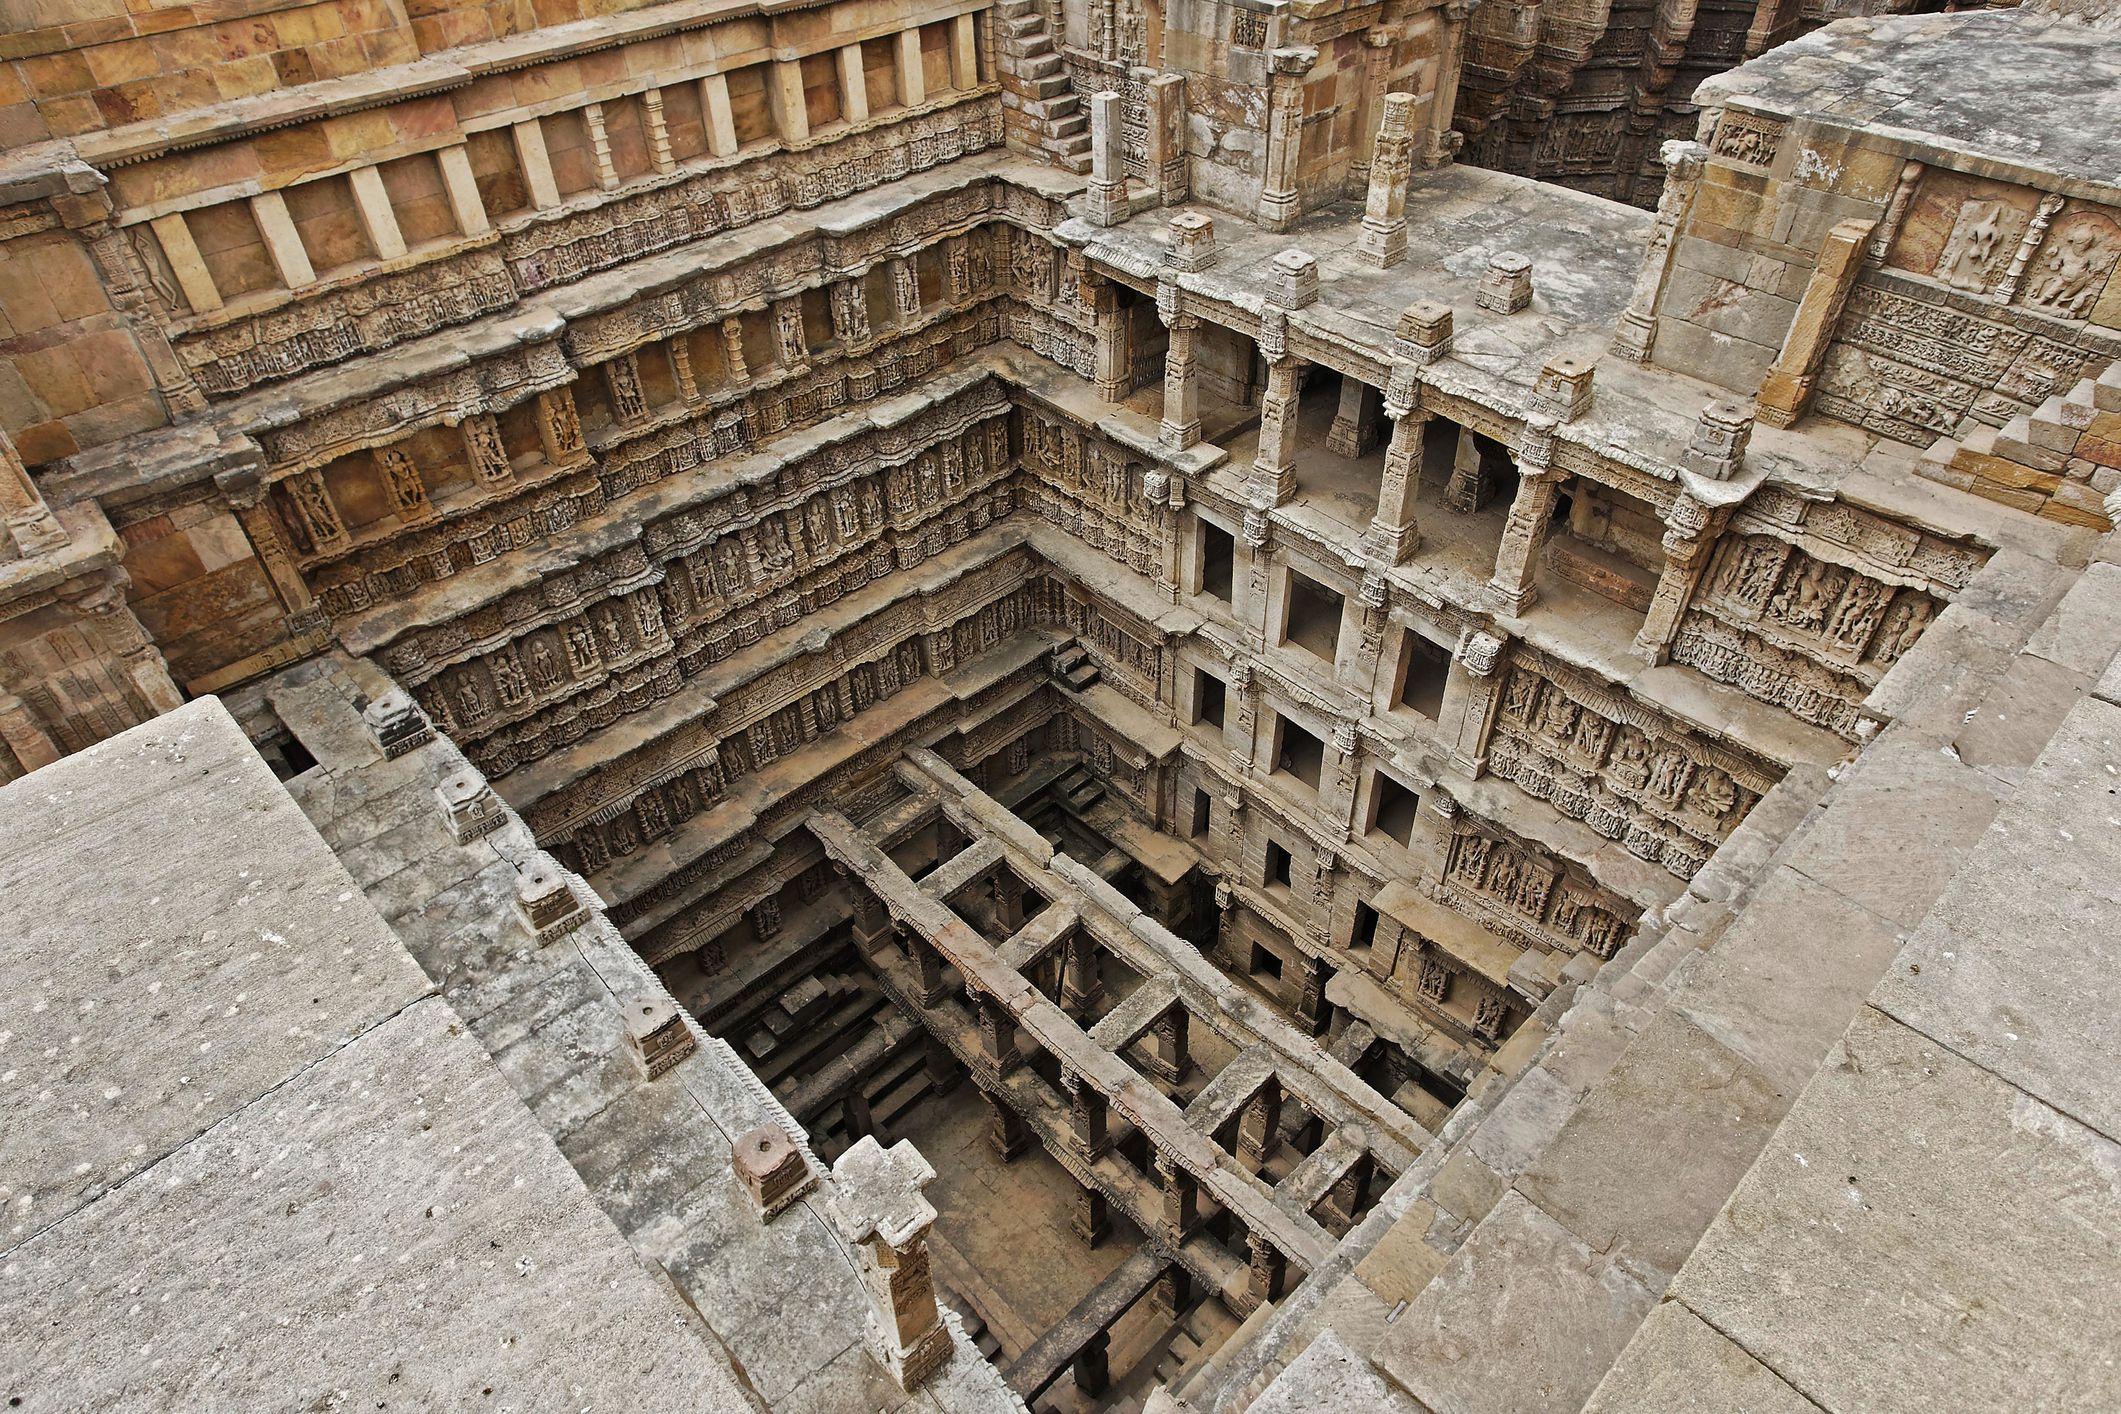 Rani ki vav, step well, stone carving, Patan, Gujarat, India